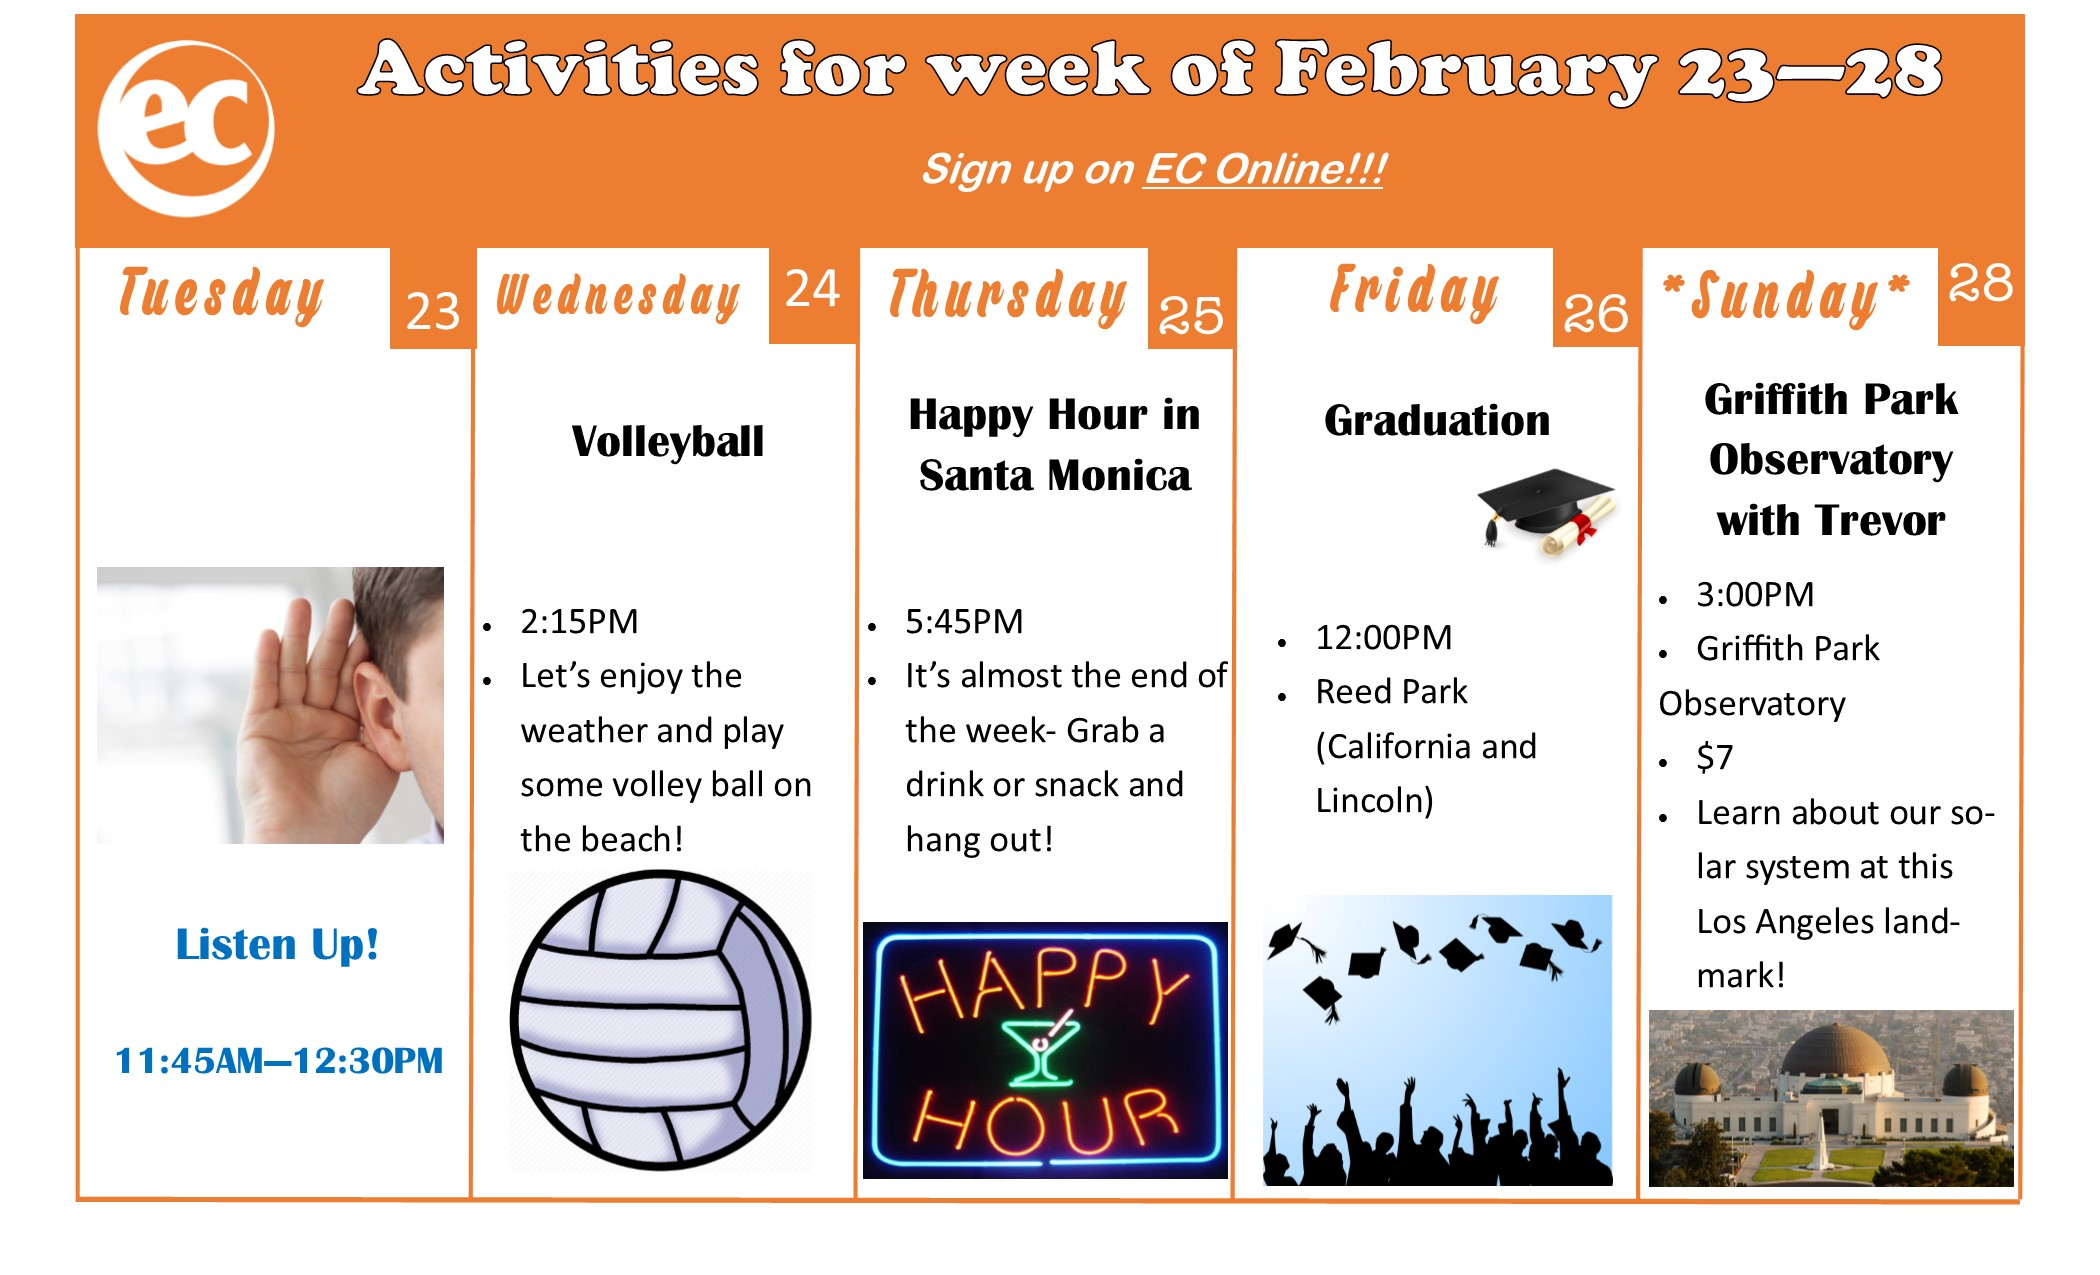 This week's activities from ECLA!